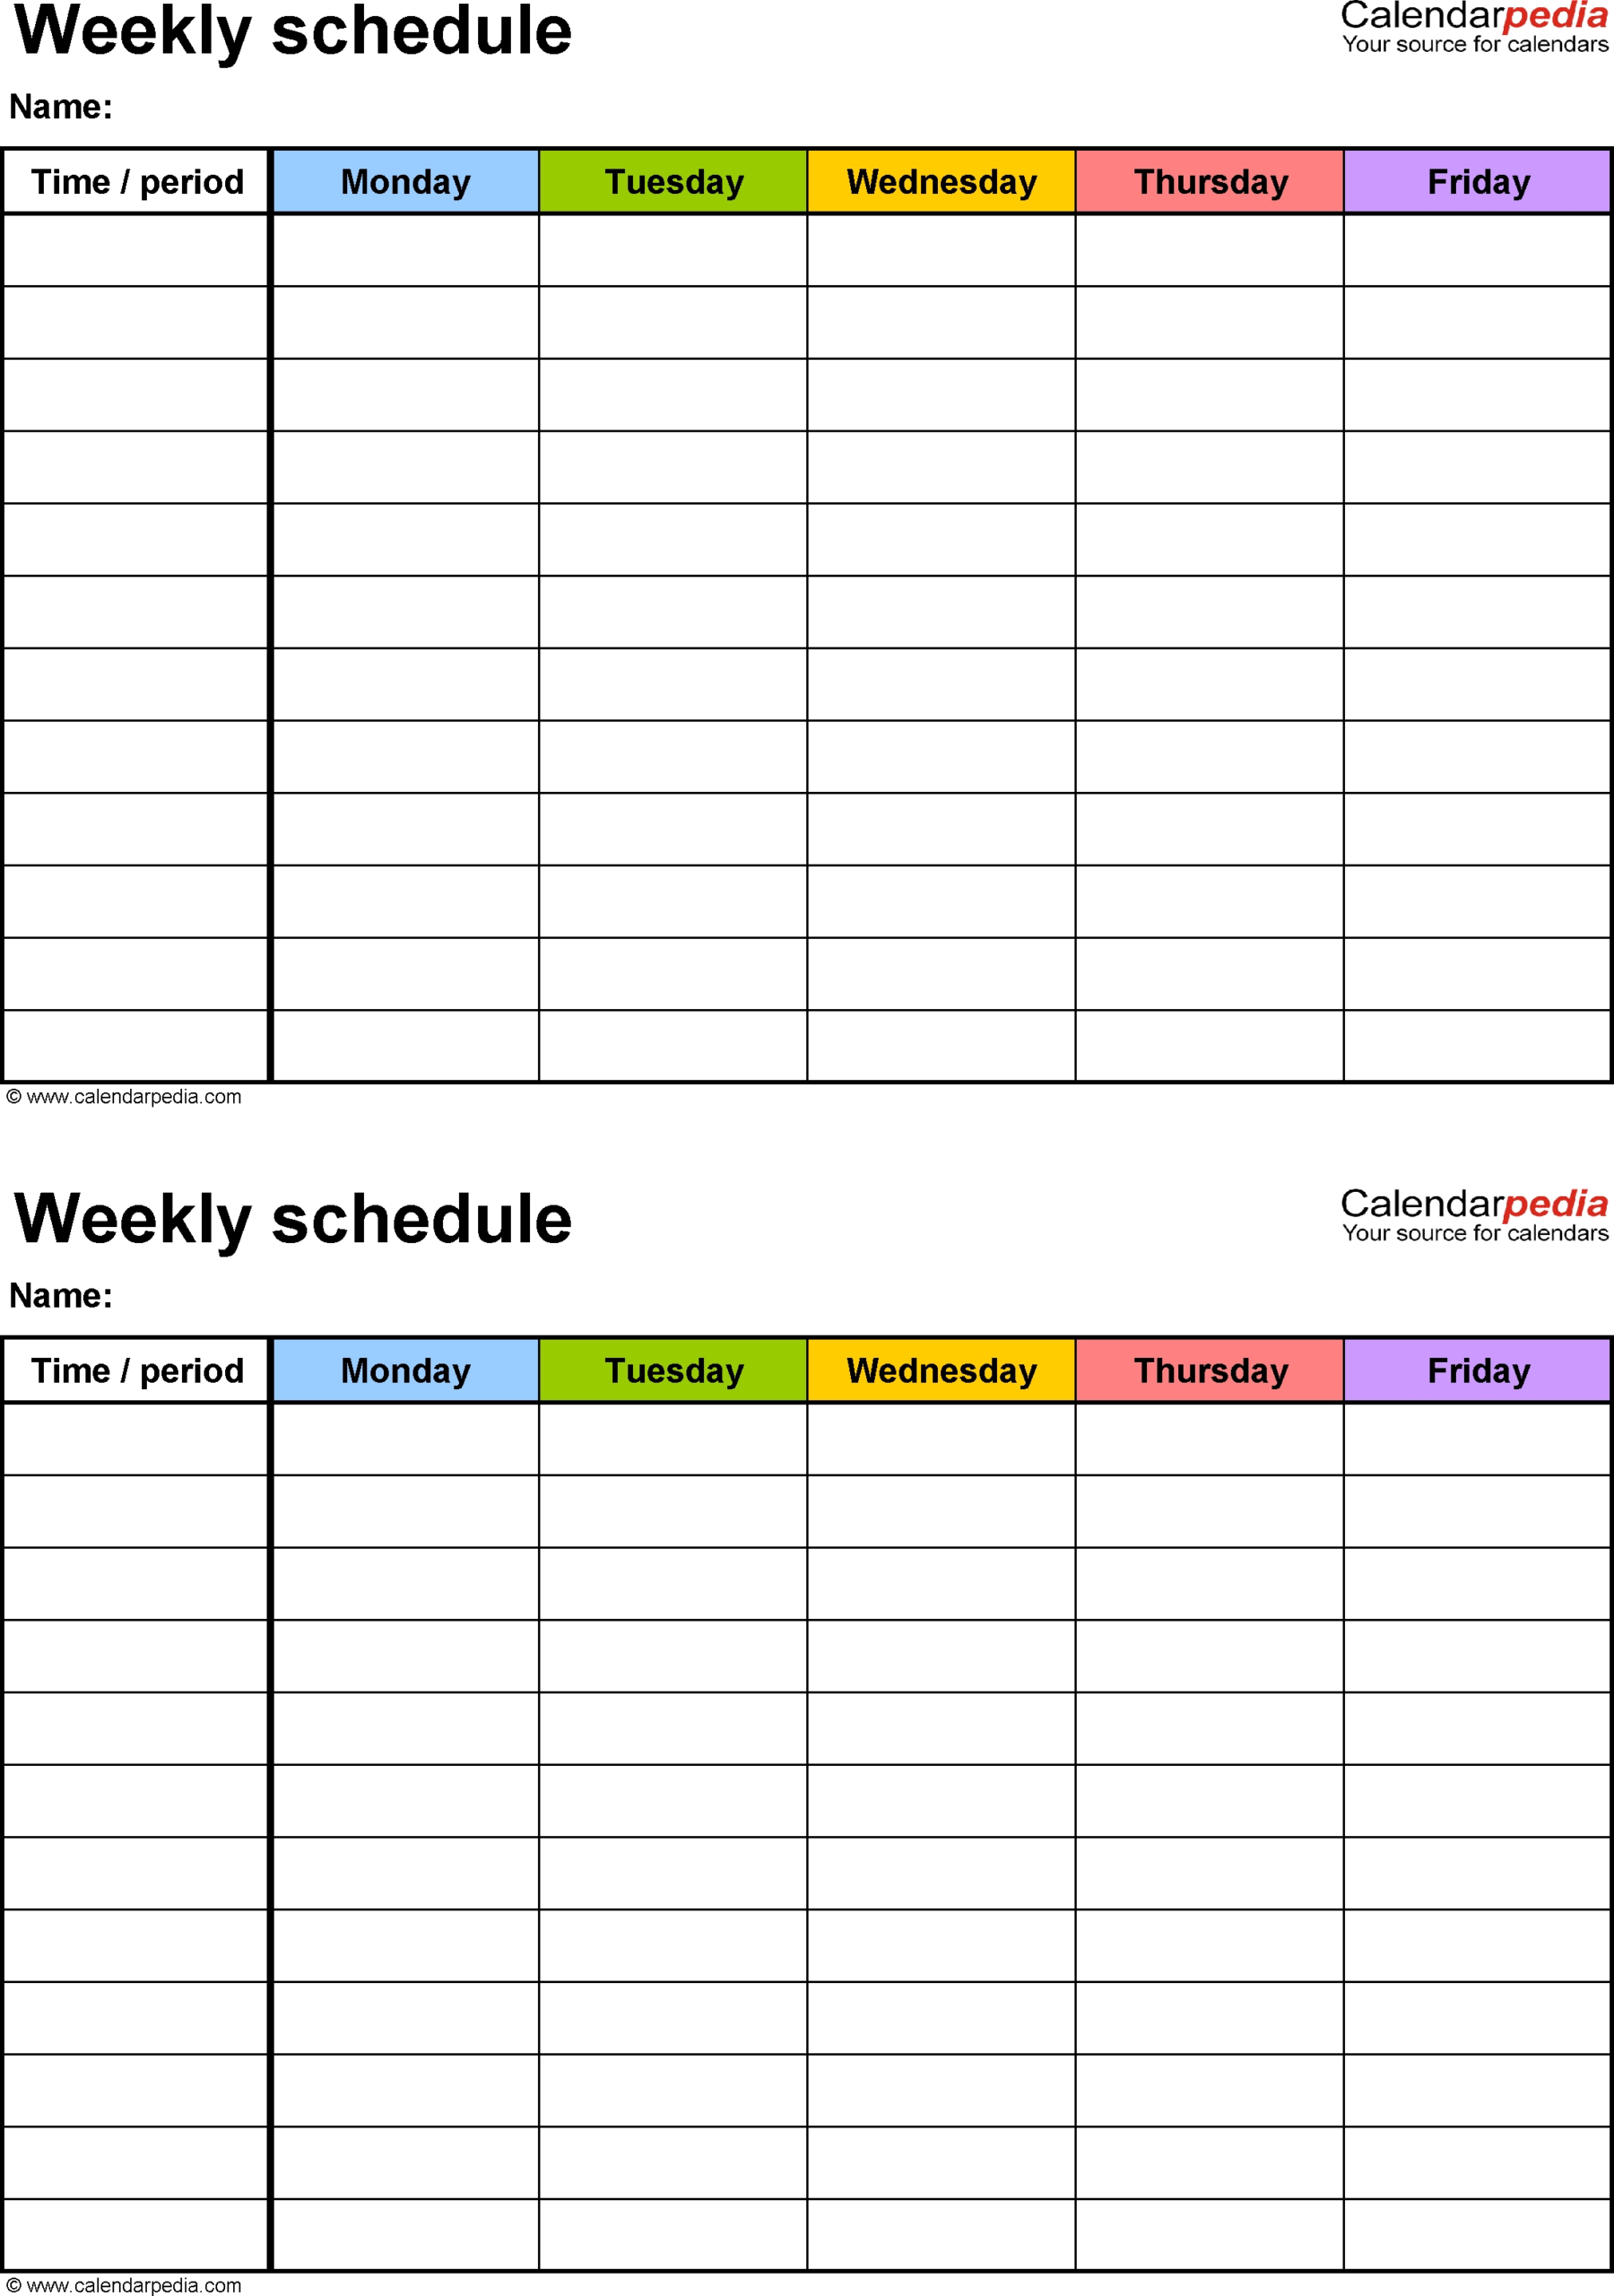 Monday Through Friday Scheule Pdf - Template Calendar Design